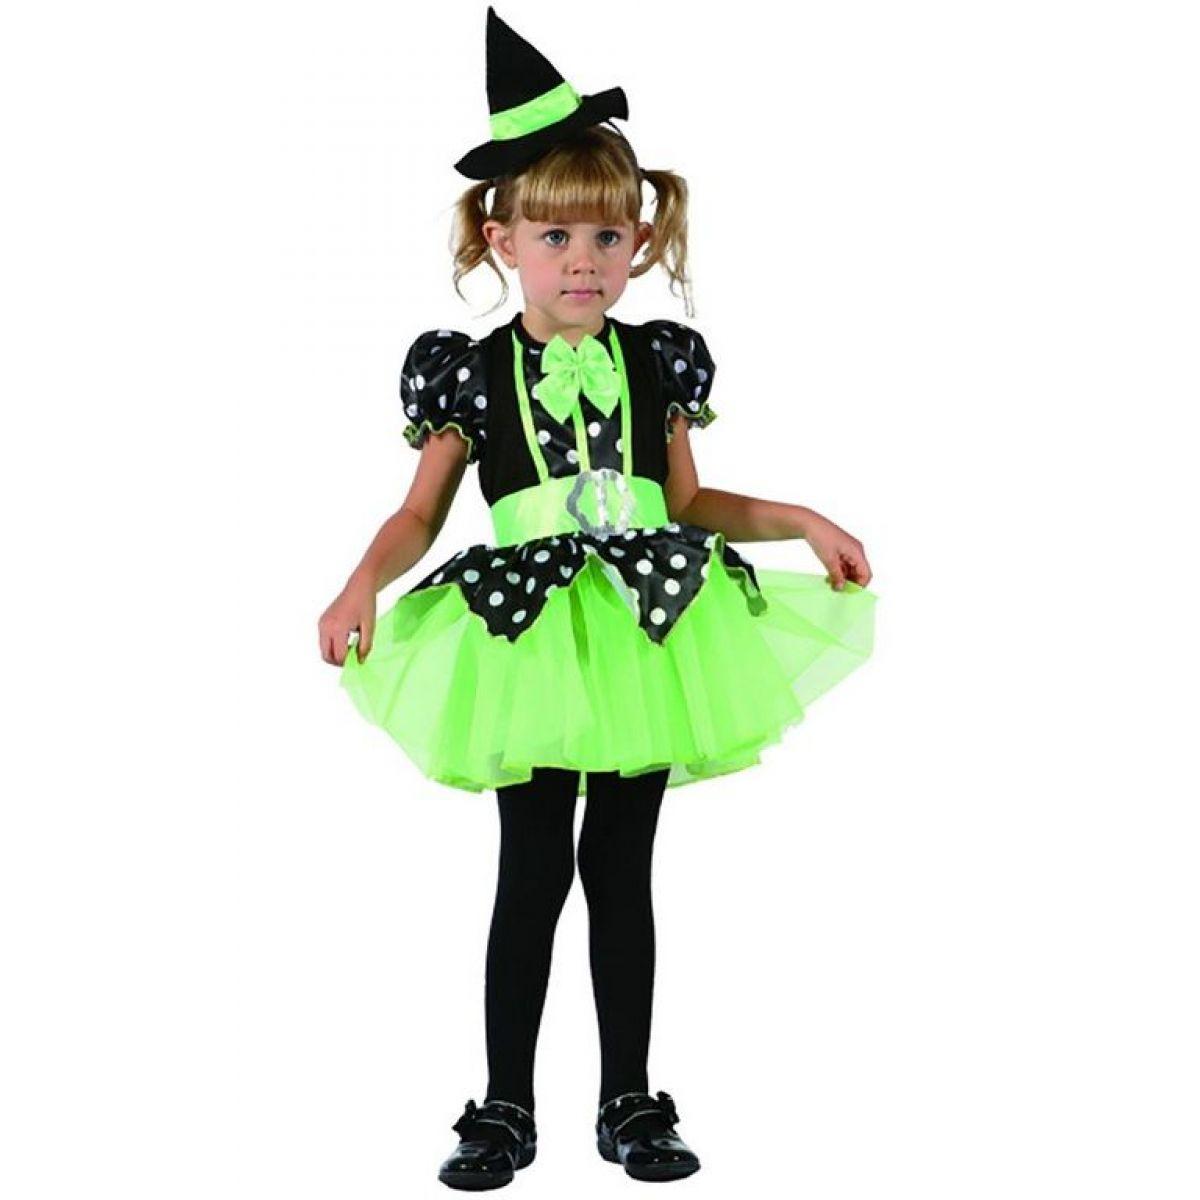 Dětské šaty na karneval čarodějka 92 - 104 cm